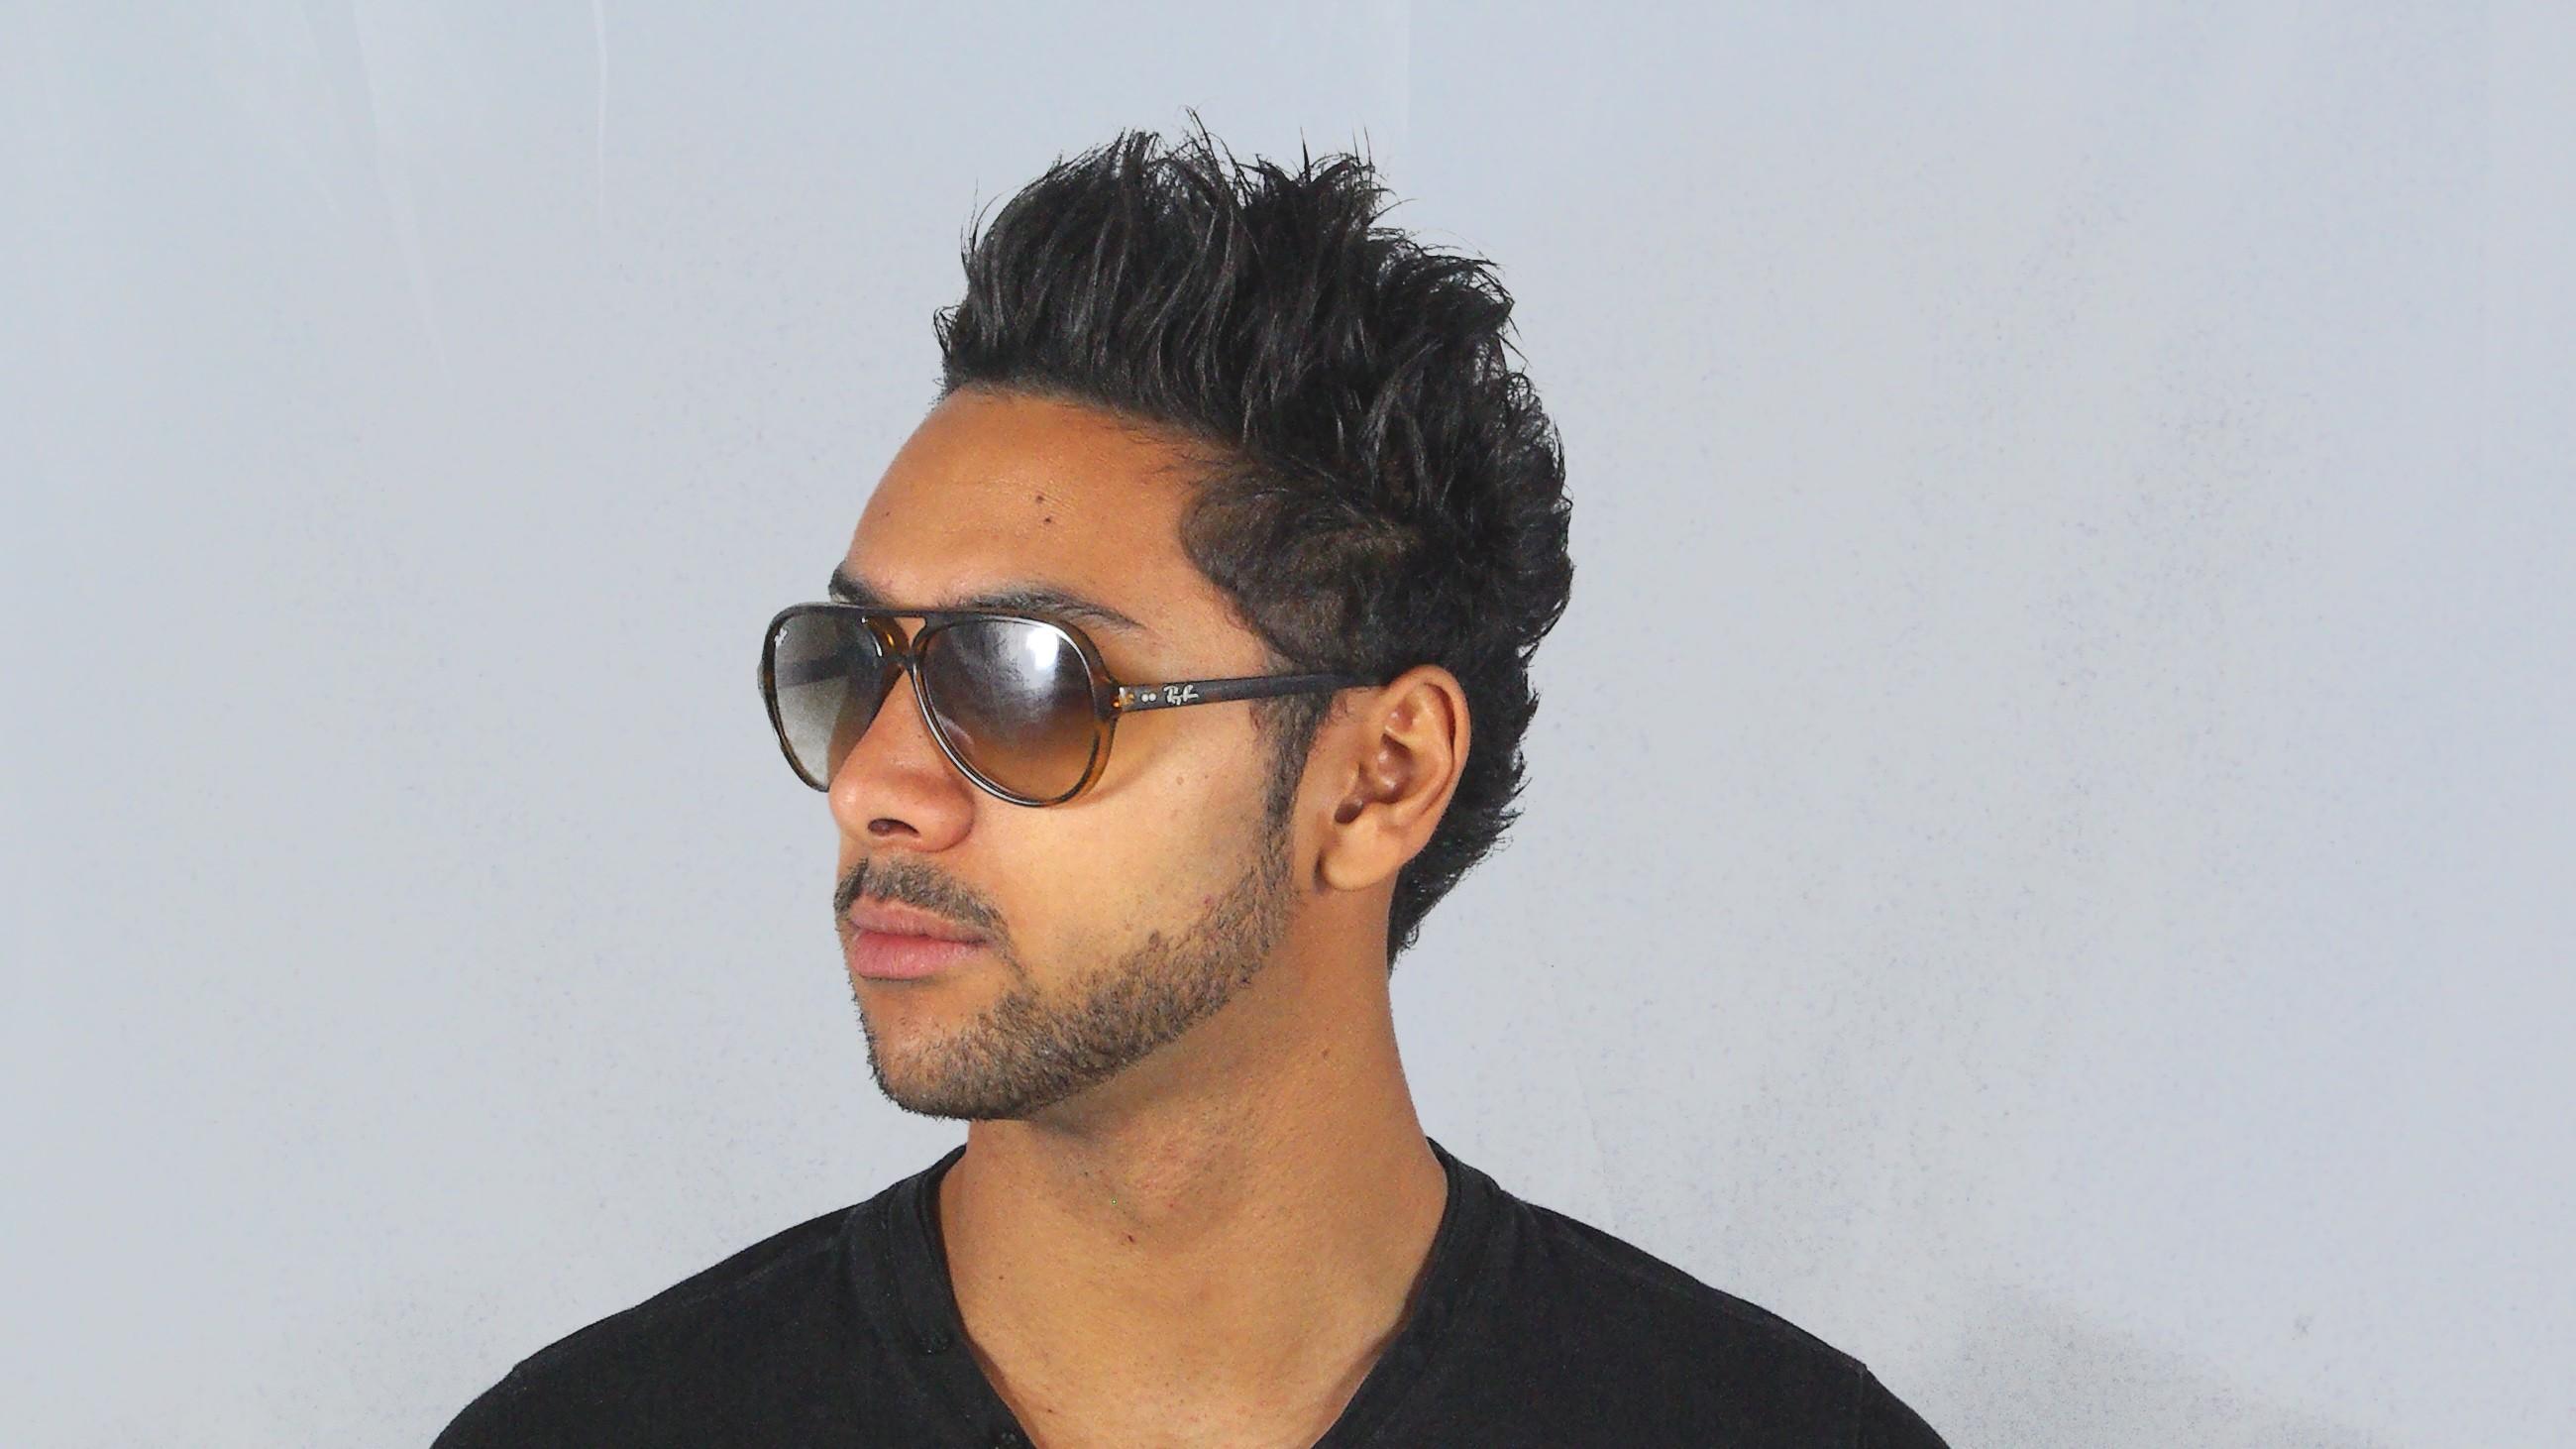 ray ban cats 5000 | Cheap sunglasses